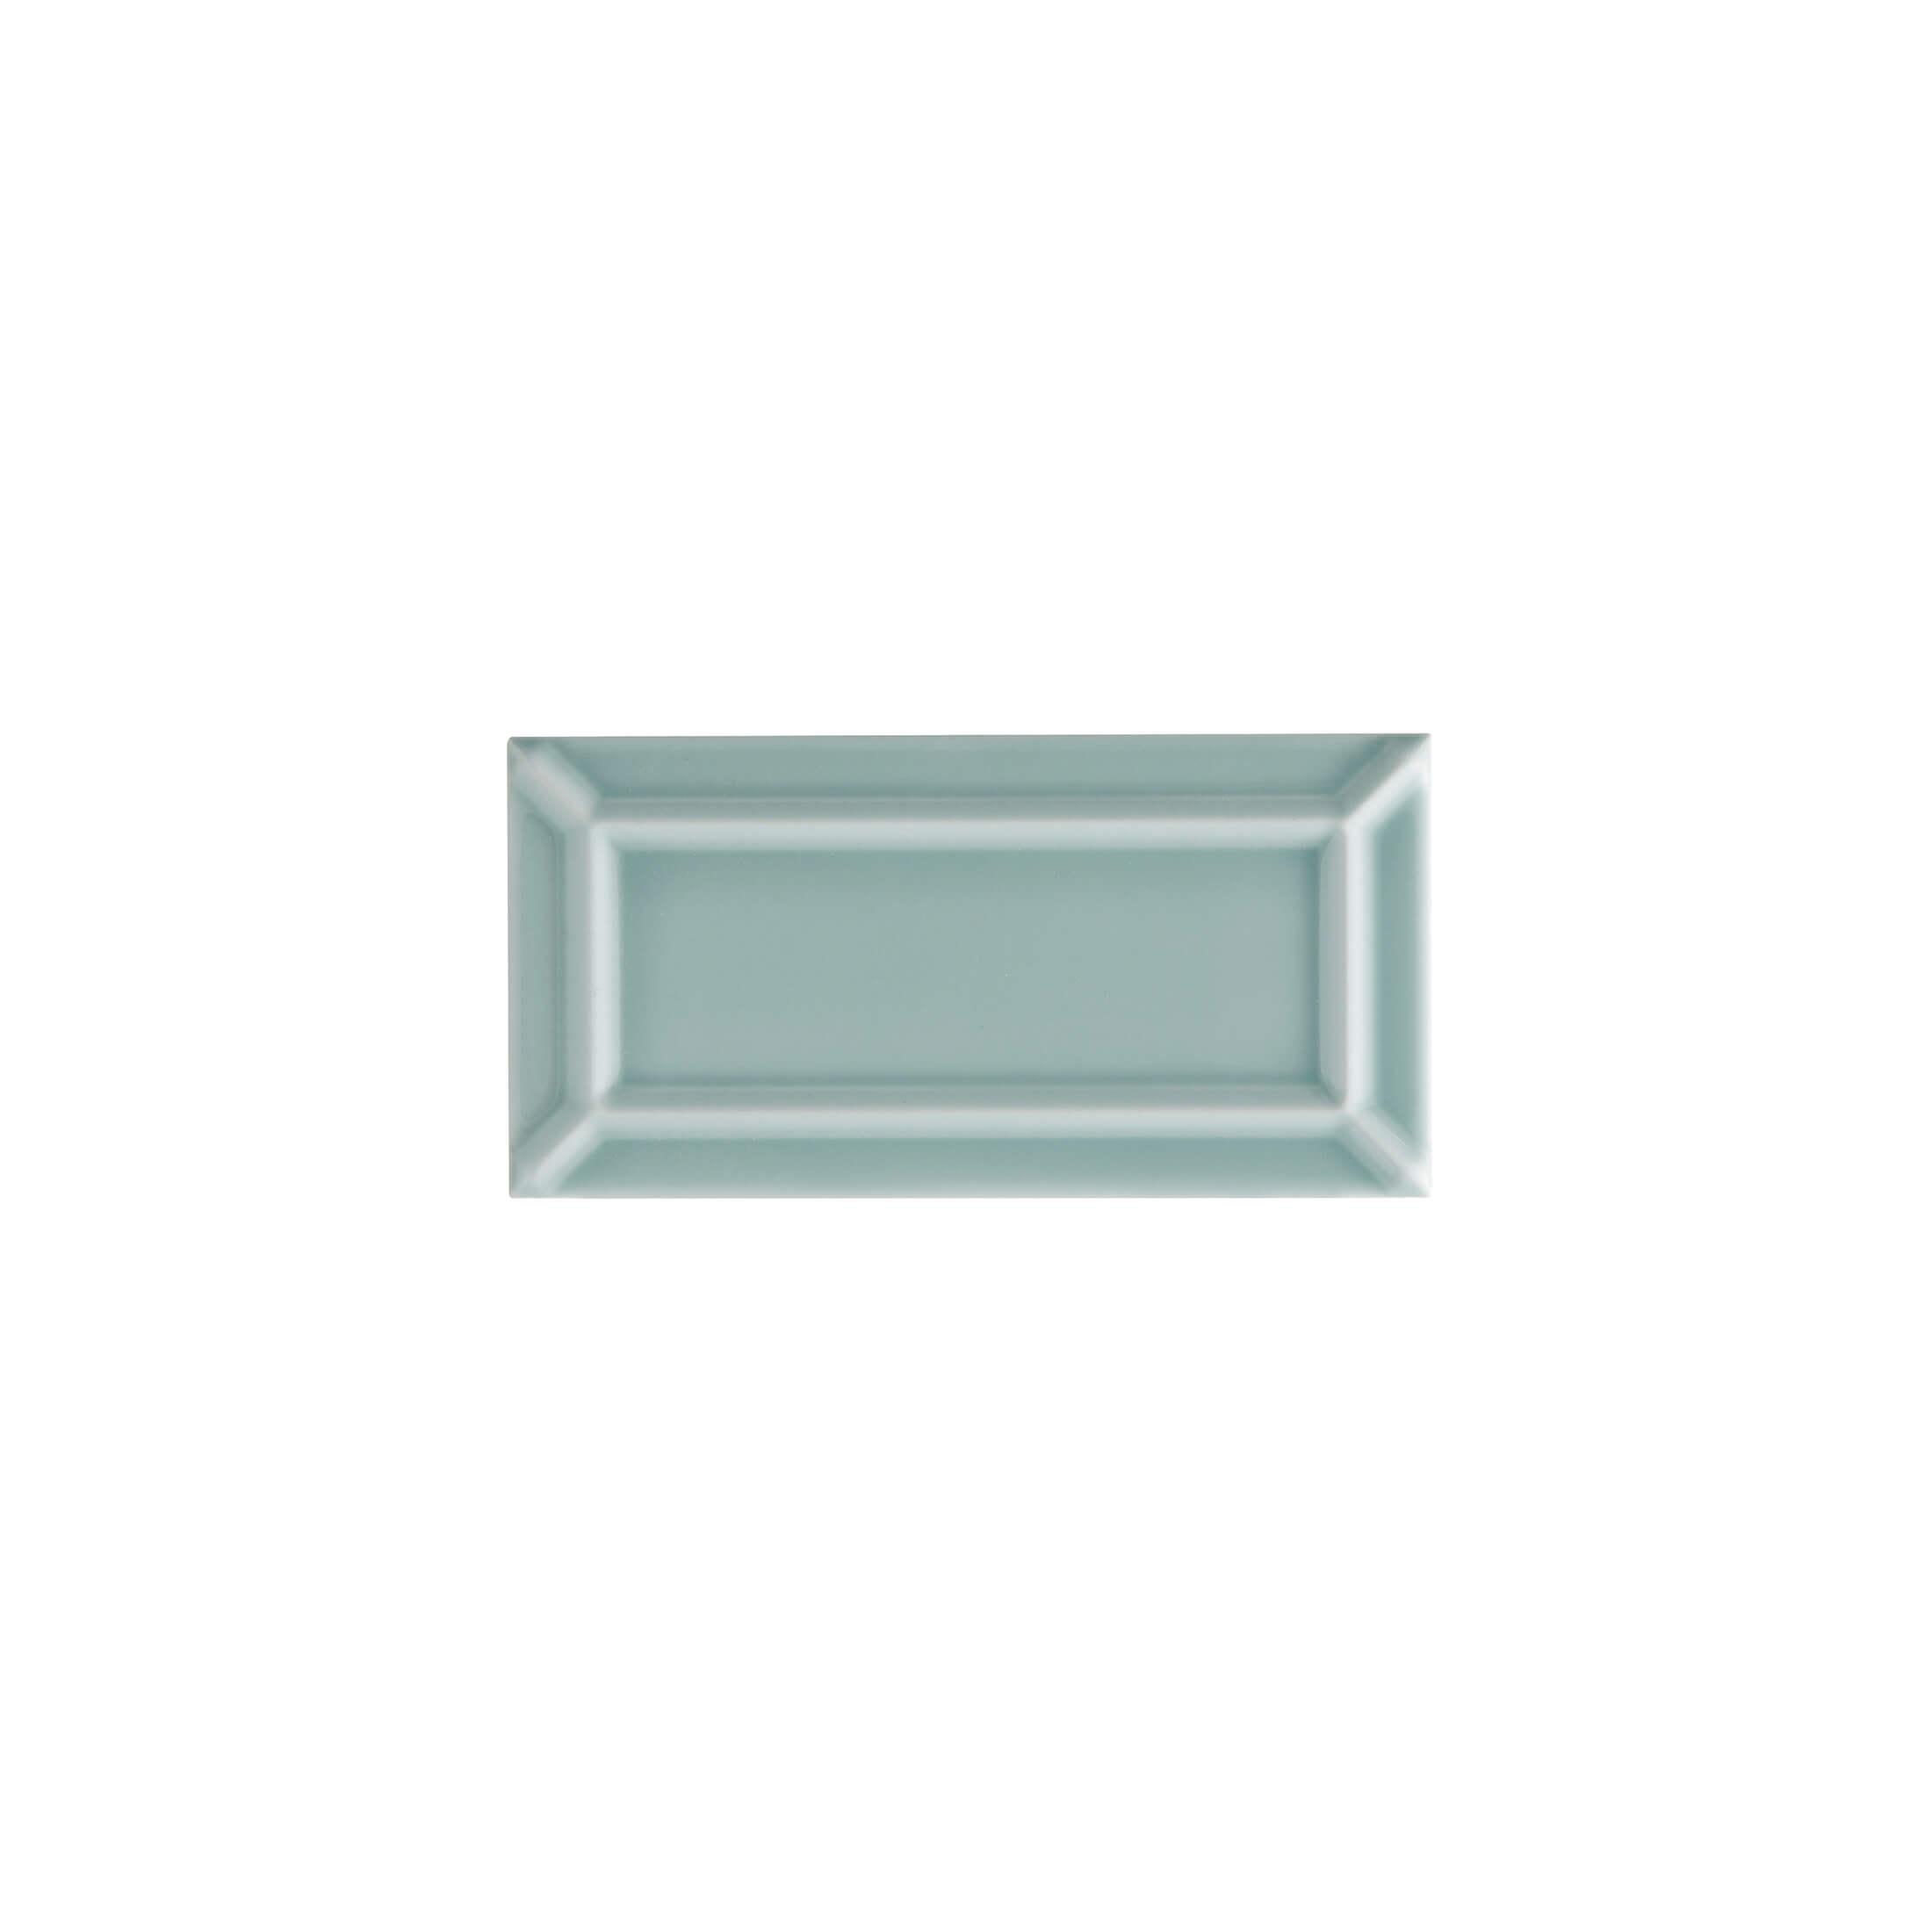 ADNE1108 - LISO EDGE - 7.5 cm X 15 cm